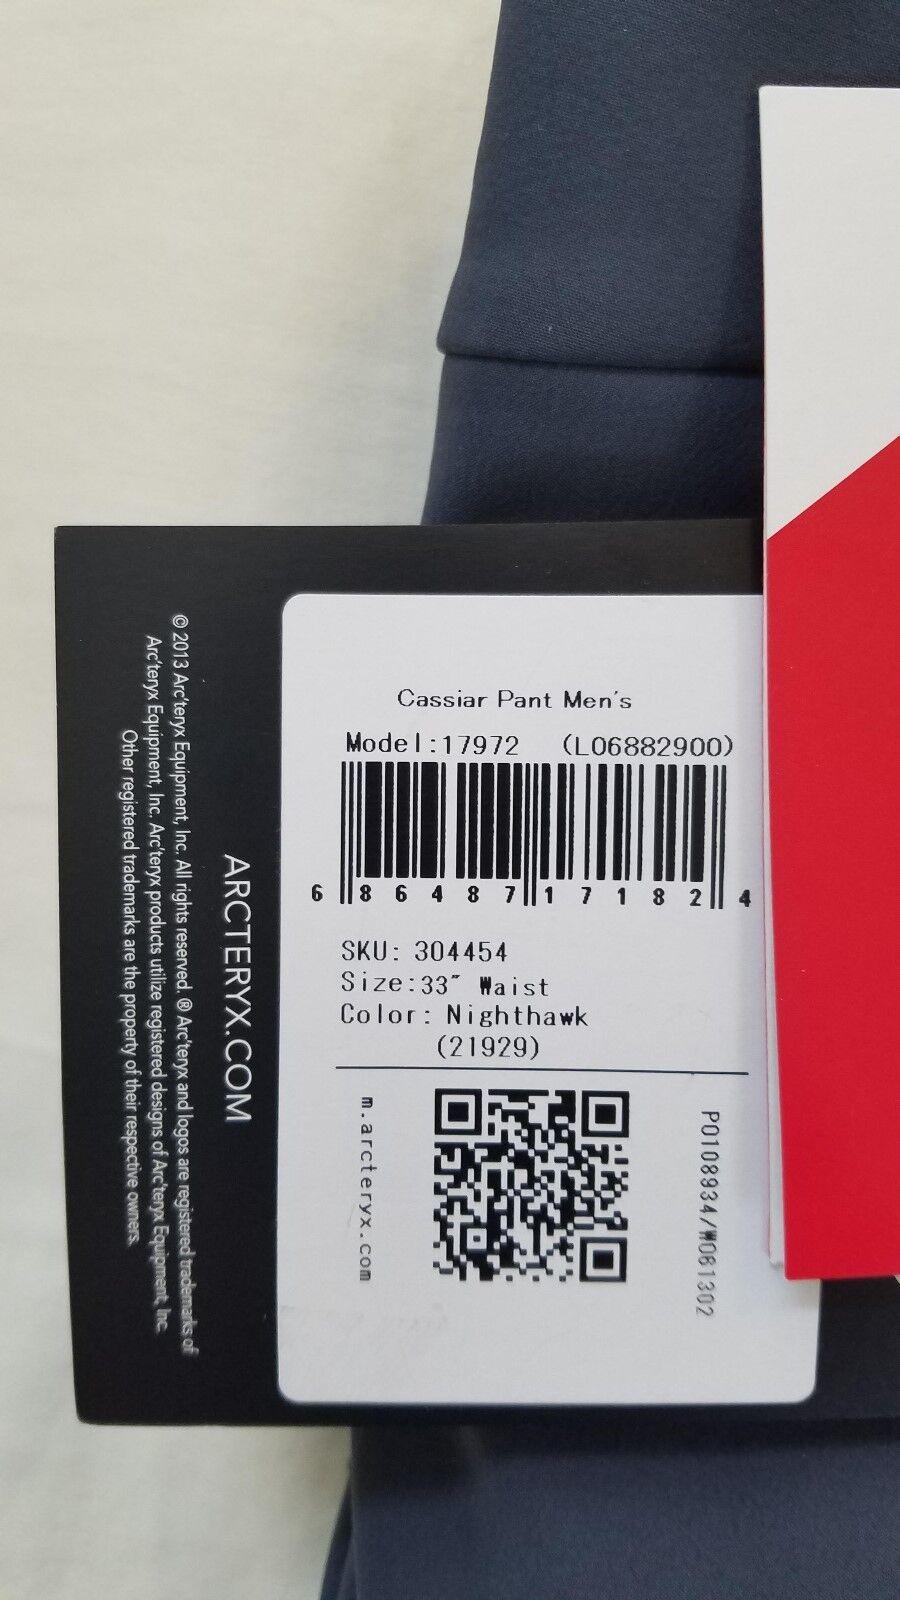 e9c1b74e7c Nuovo 2018 Arcteryx Cassiar Pant Uomo Nighthawk M 33 32 304454 ski pants  snowboard